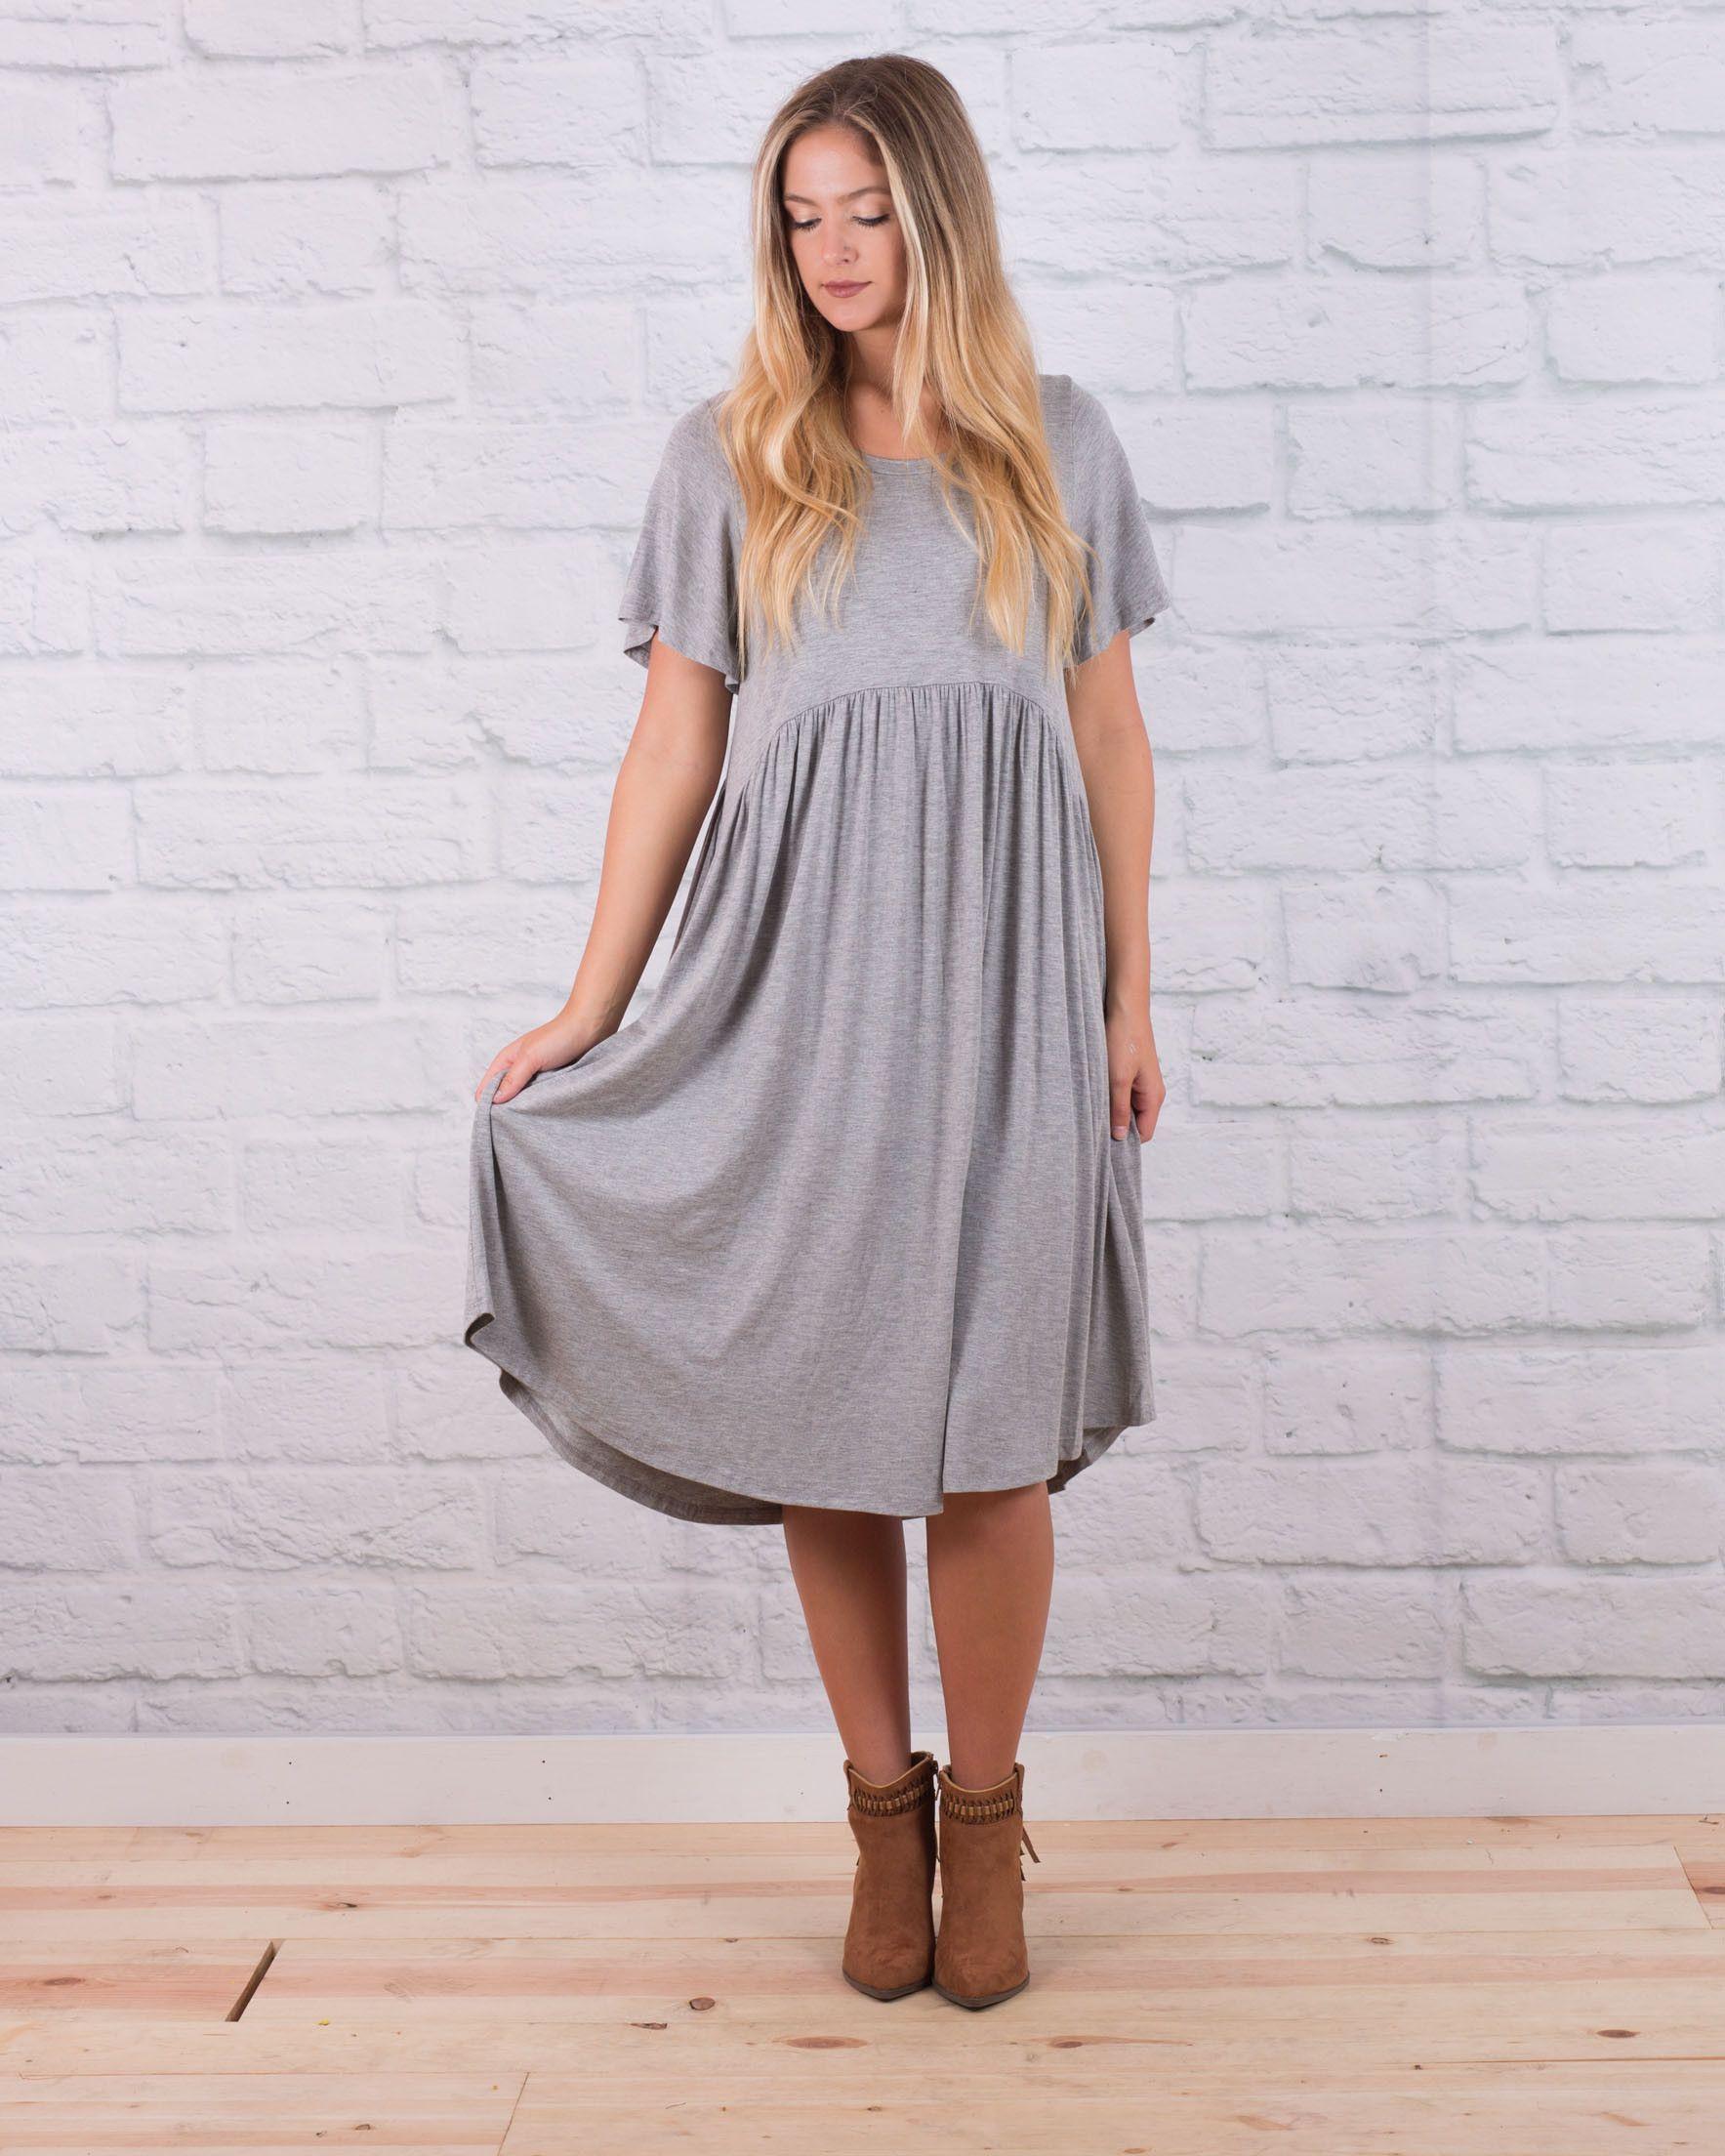 Weekend stroll dress shop style revel pinterest girl model